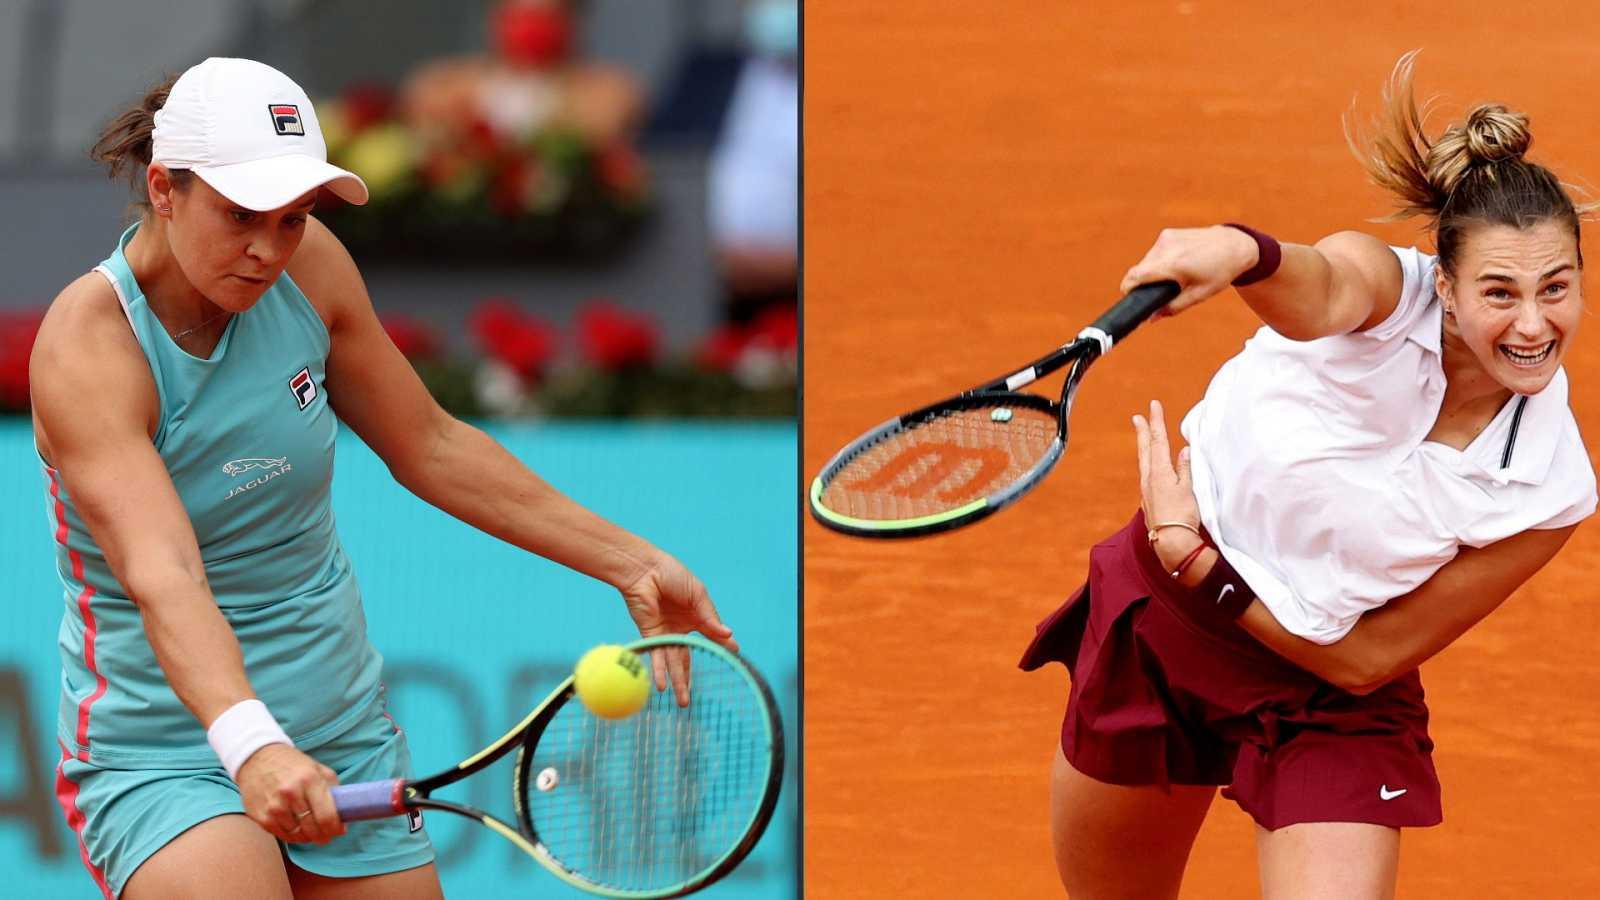 Tenis - WTA Mutua Madrid Open. Final: Ashleigh Barty - Aryna Sabalenka - ver ahora